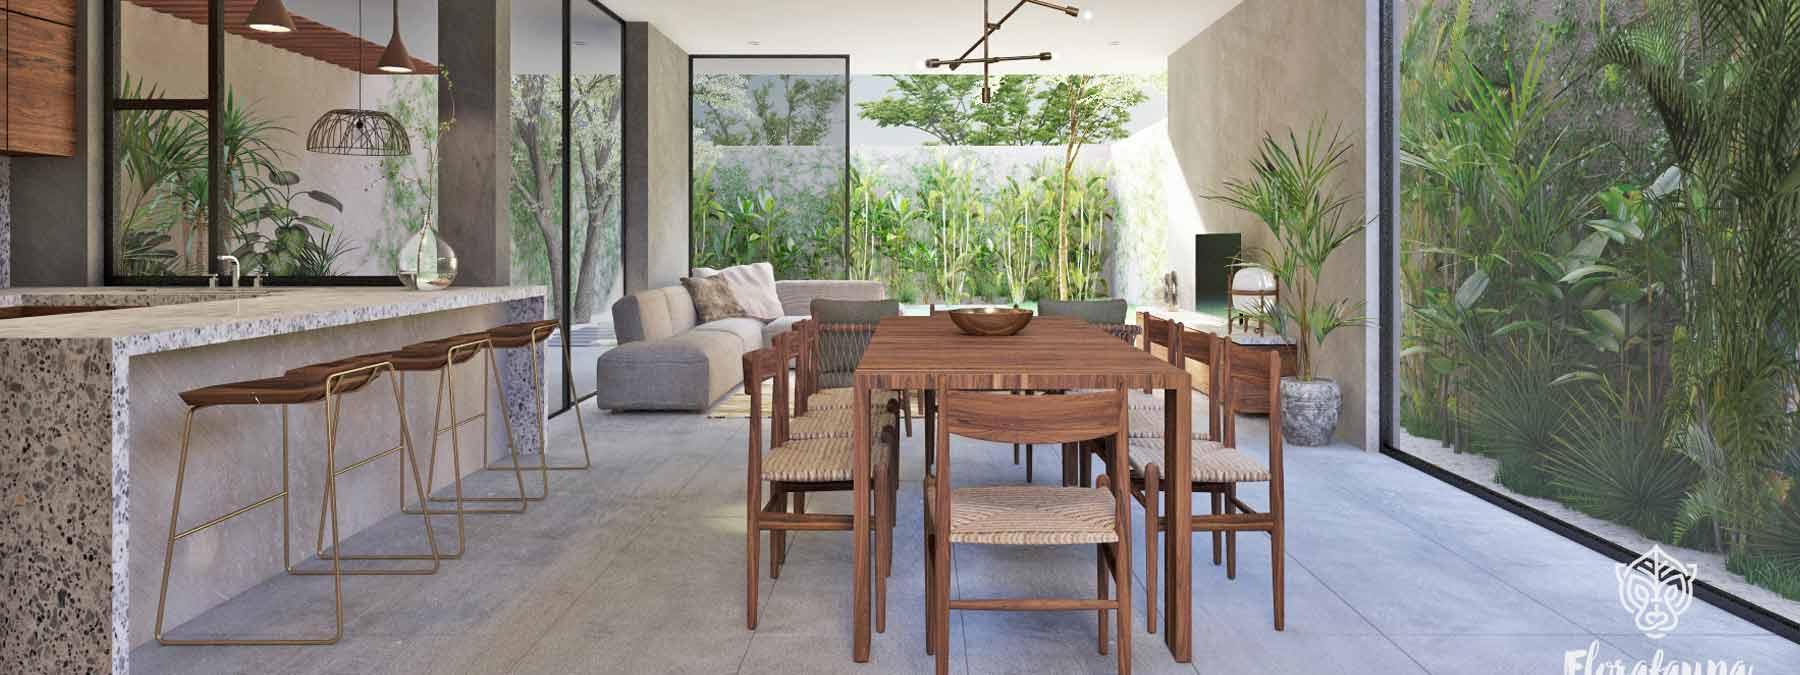 Flroafauna-Tulum-CENTER-HOME_Dining